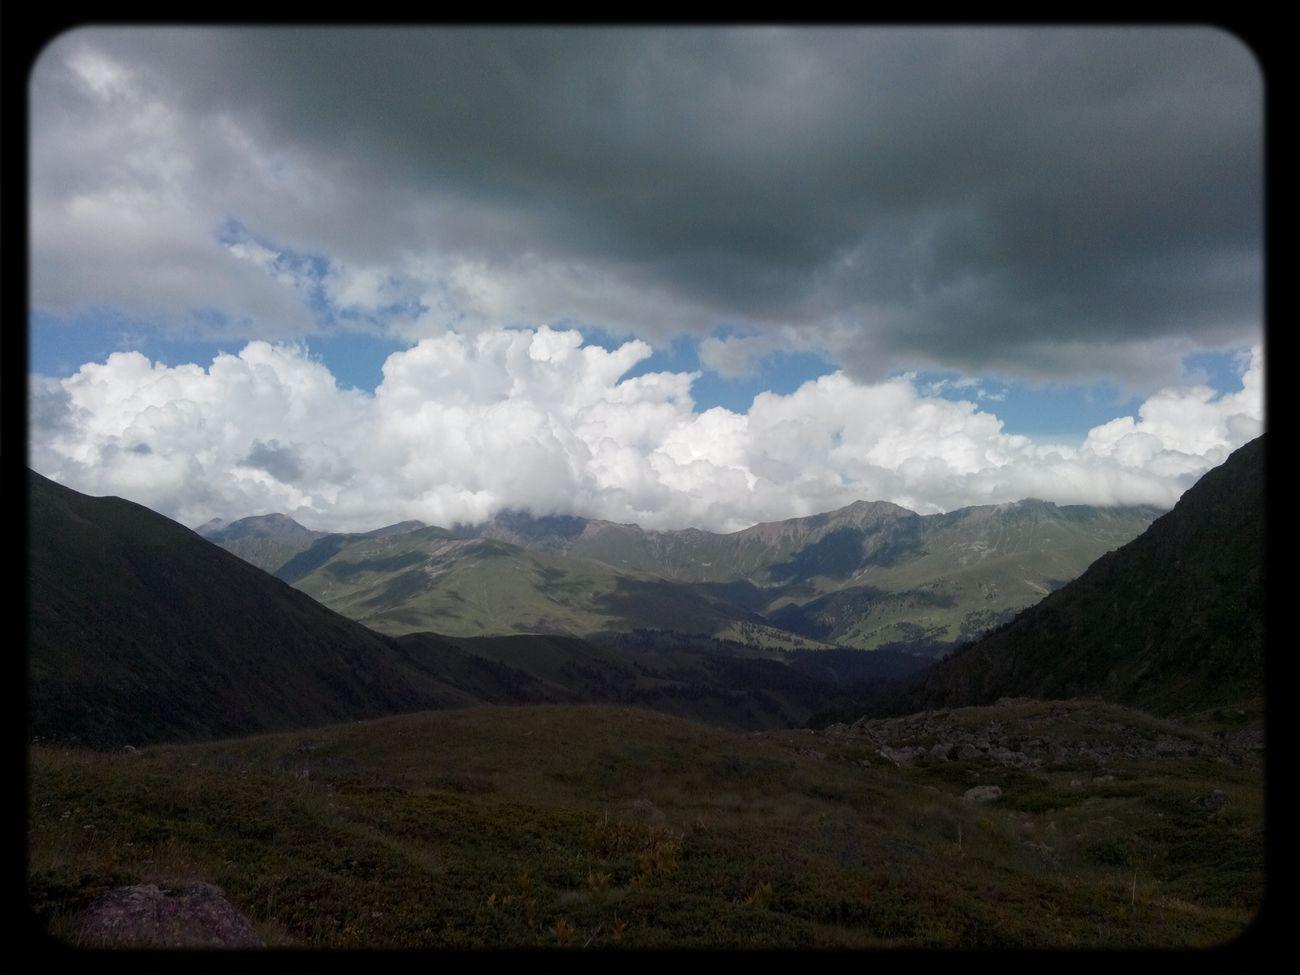 Enjoying Life облака горы улёт